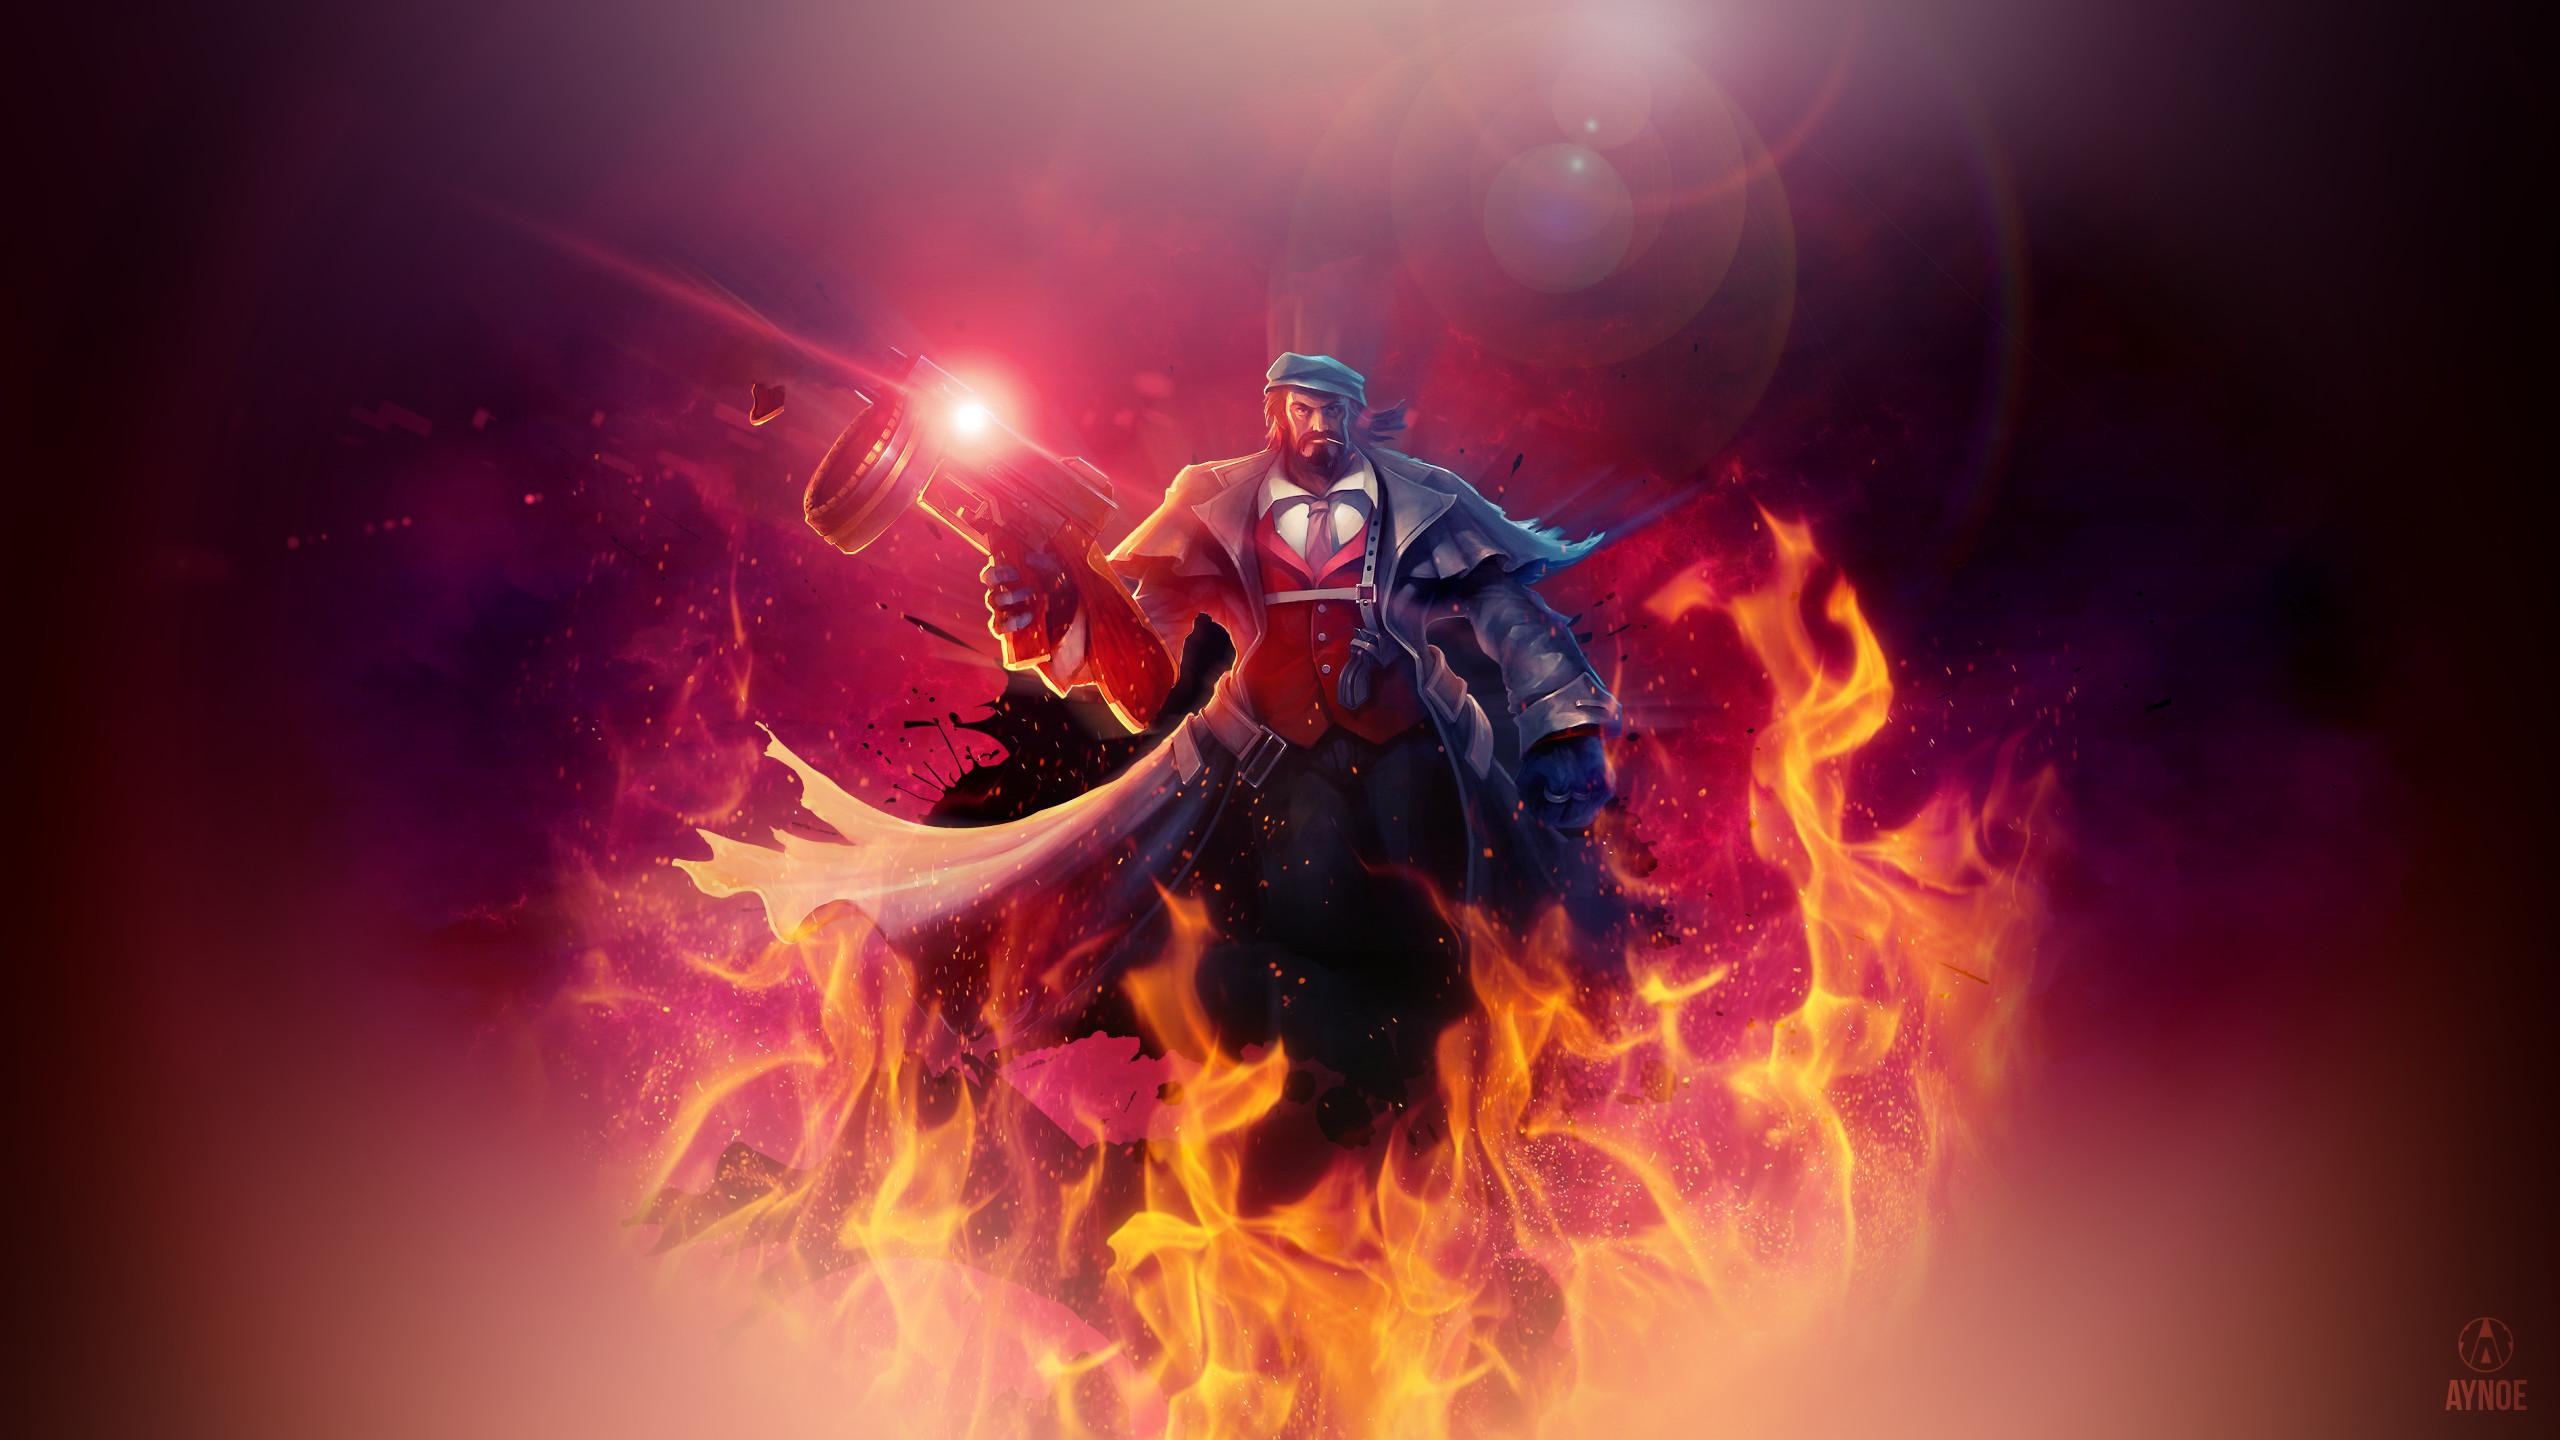 General League of Legends ADC grave